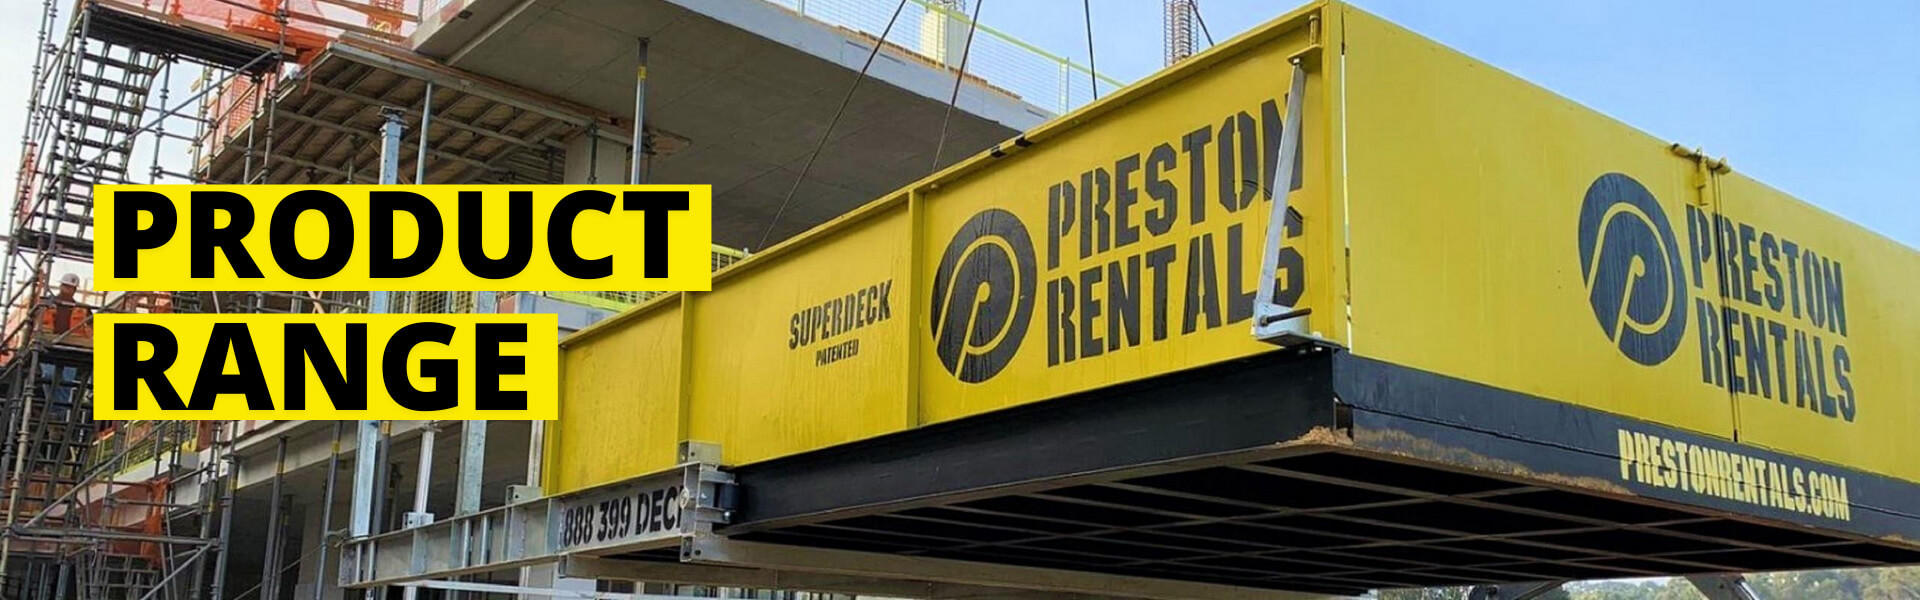 Preston Rental Products